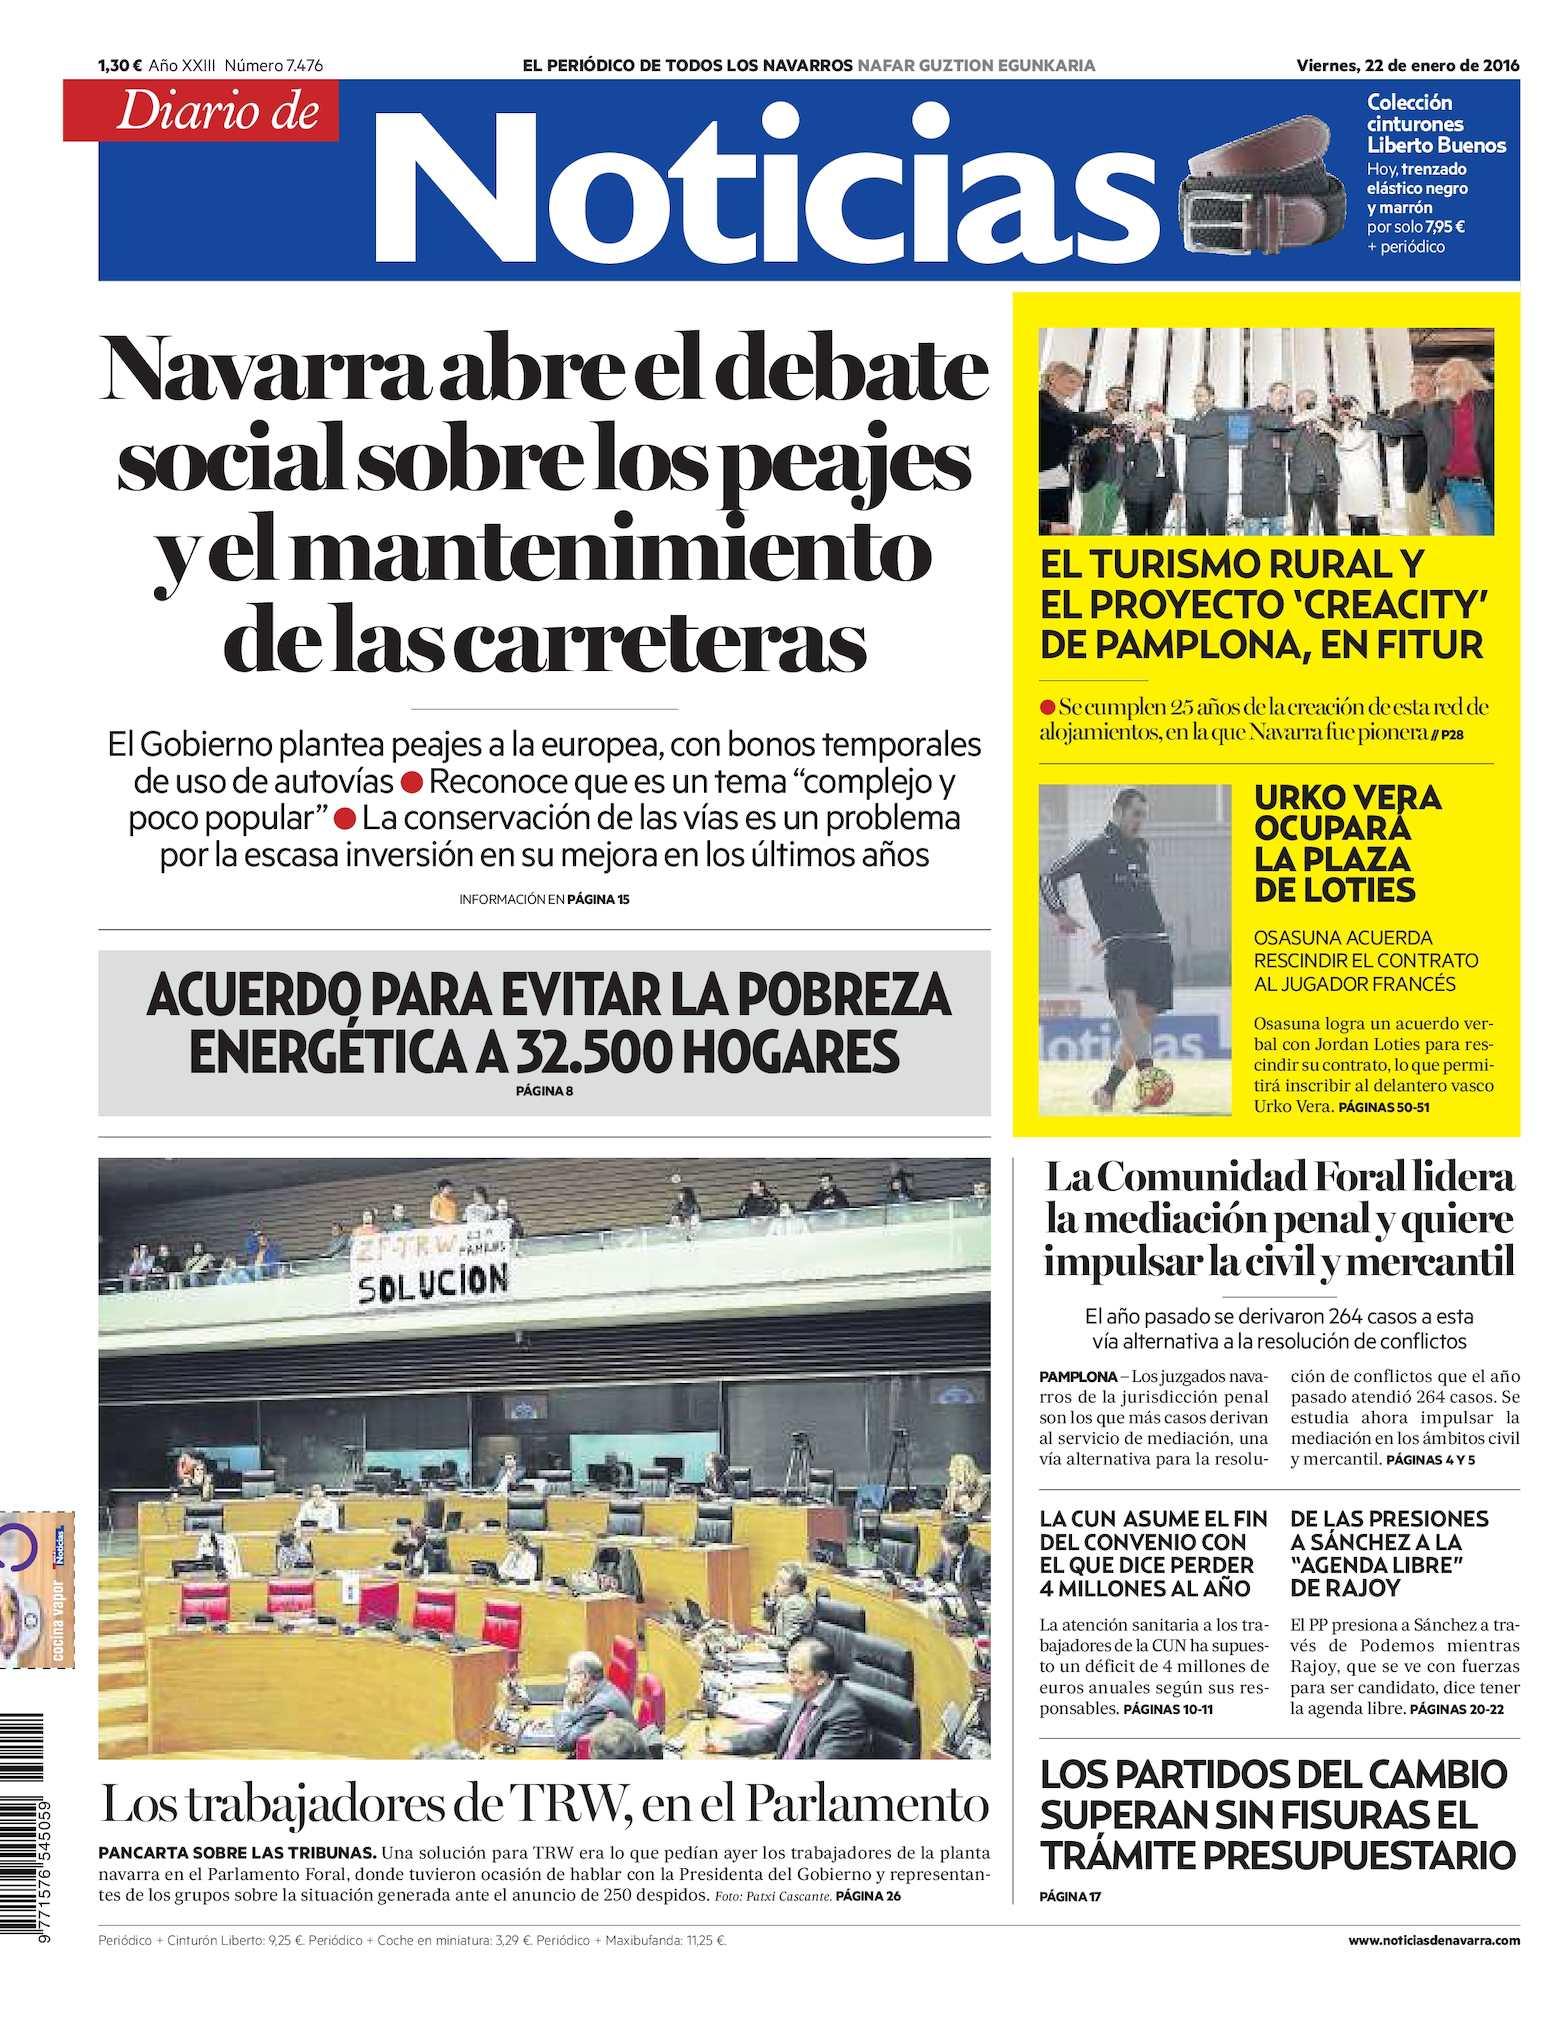 Calaméo - Diario de Noticias 20160122 e60479c01af